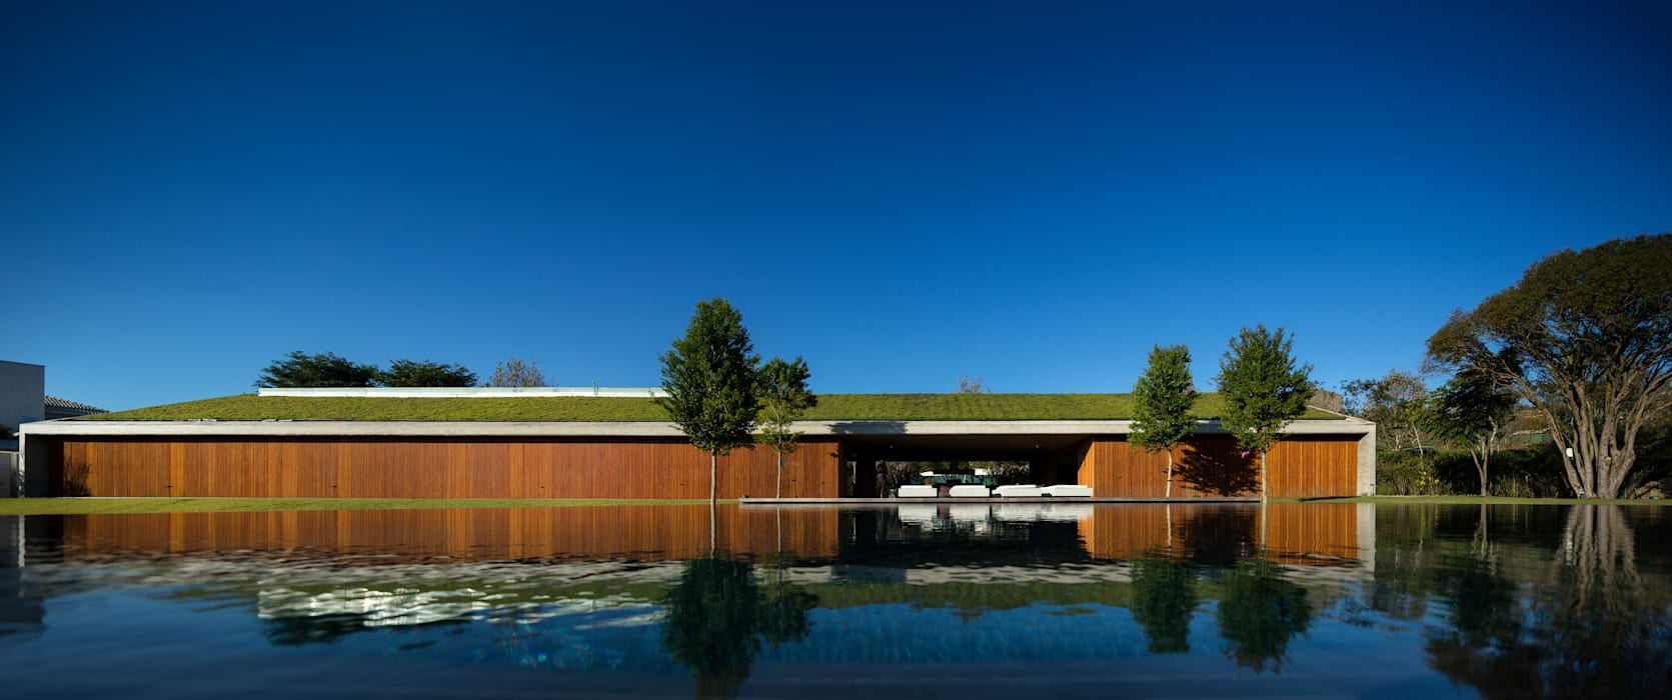 Studio MK27 Modern home